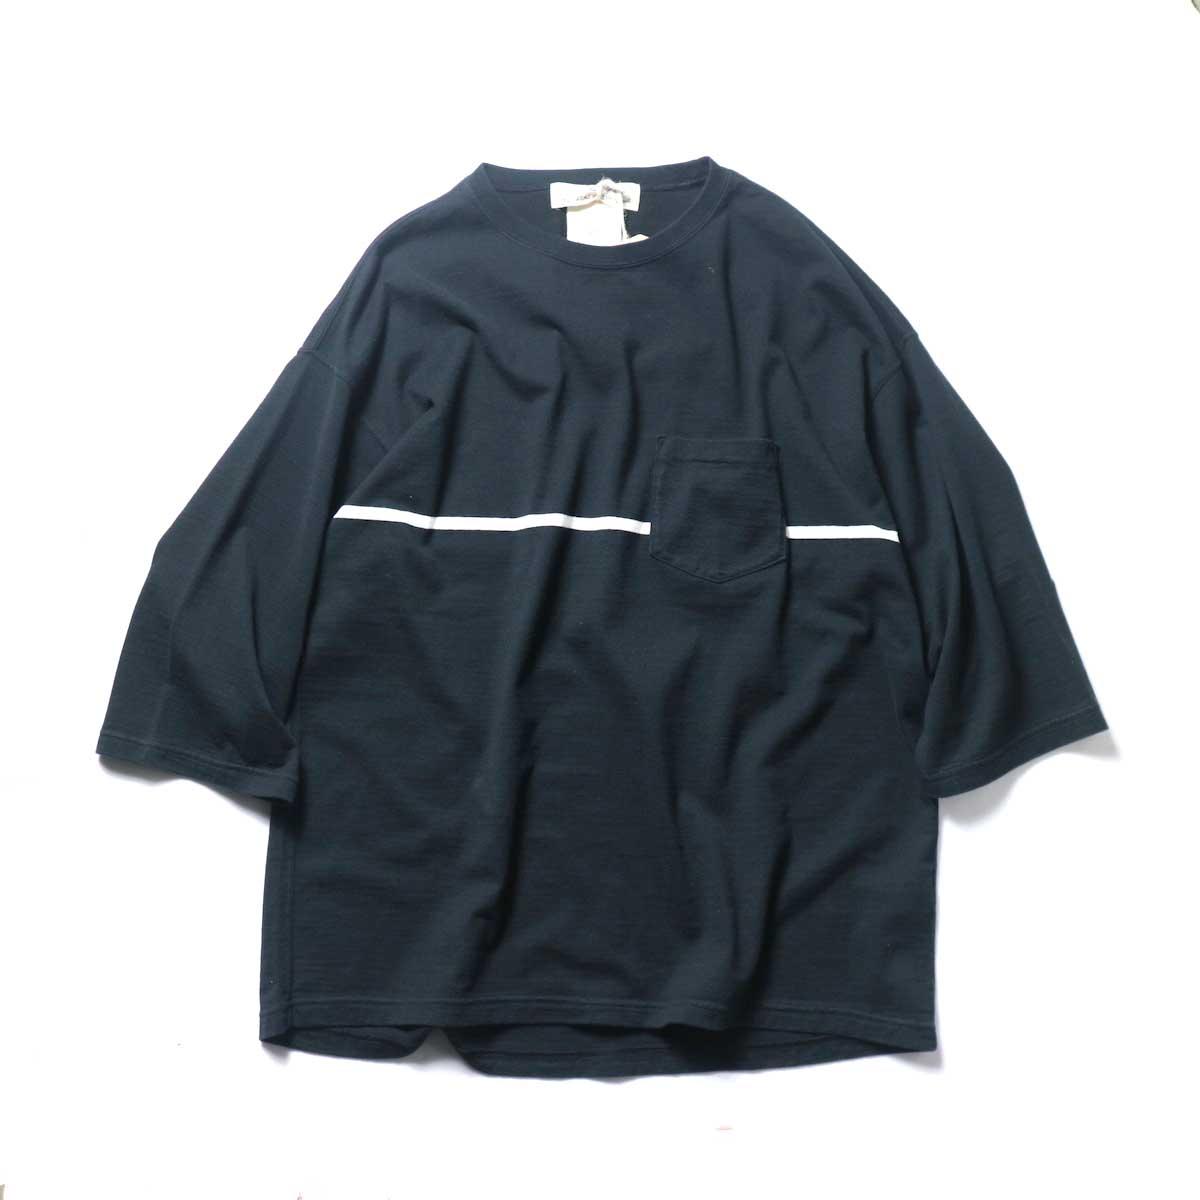 REMI RELIEF / 24Gパネル胸ボーダー七分袖 (Black)